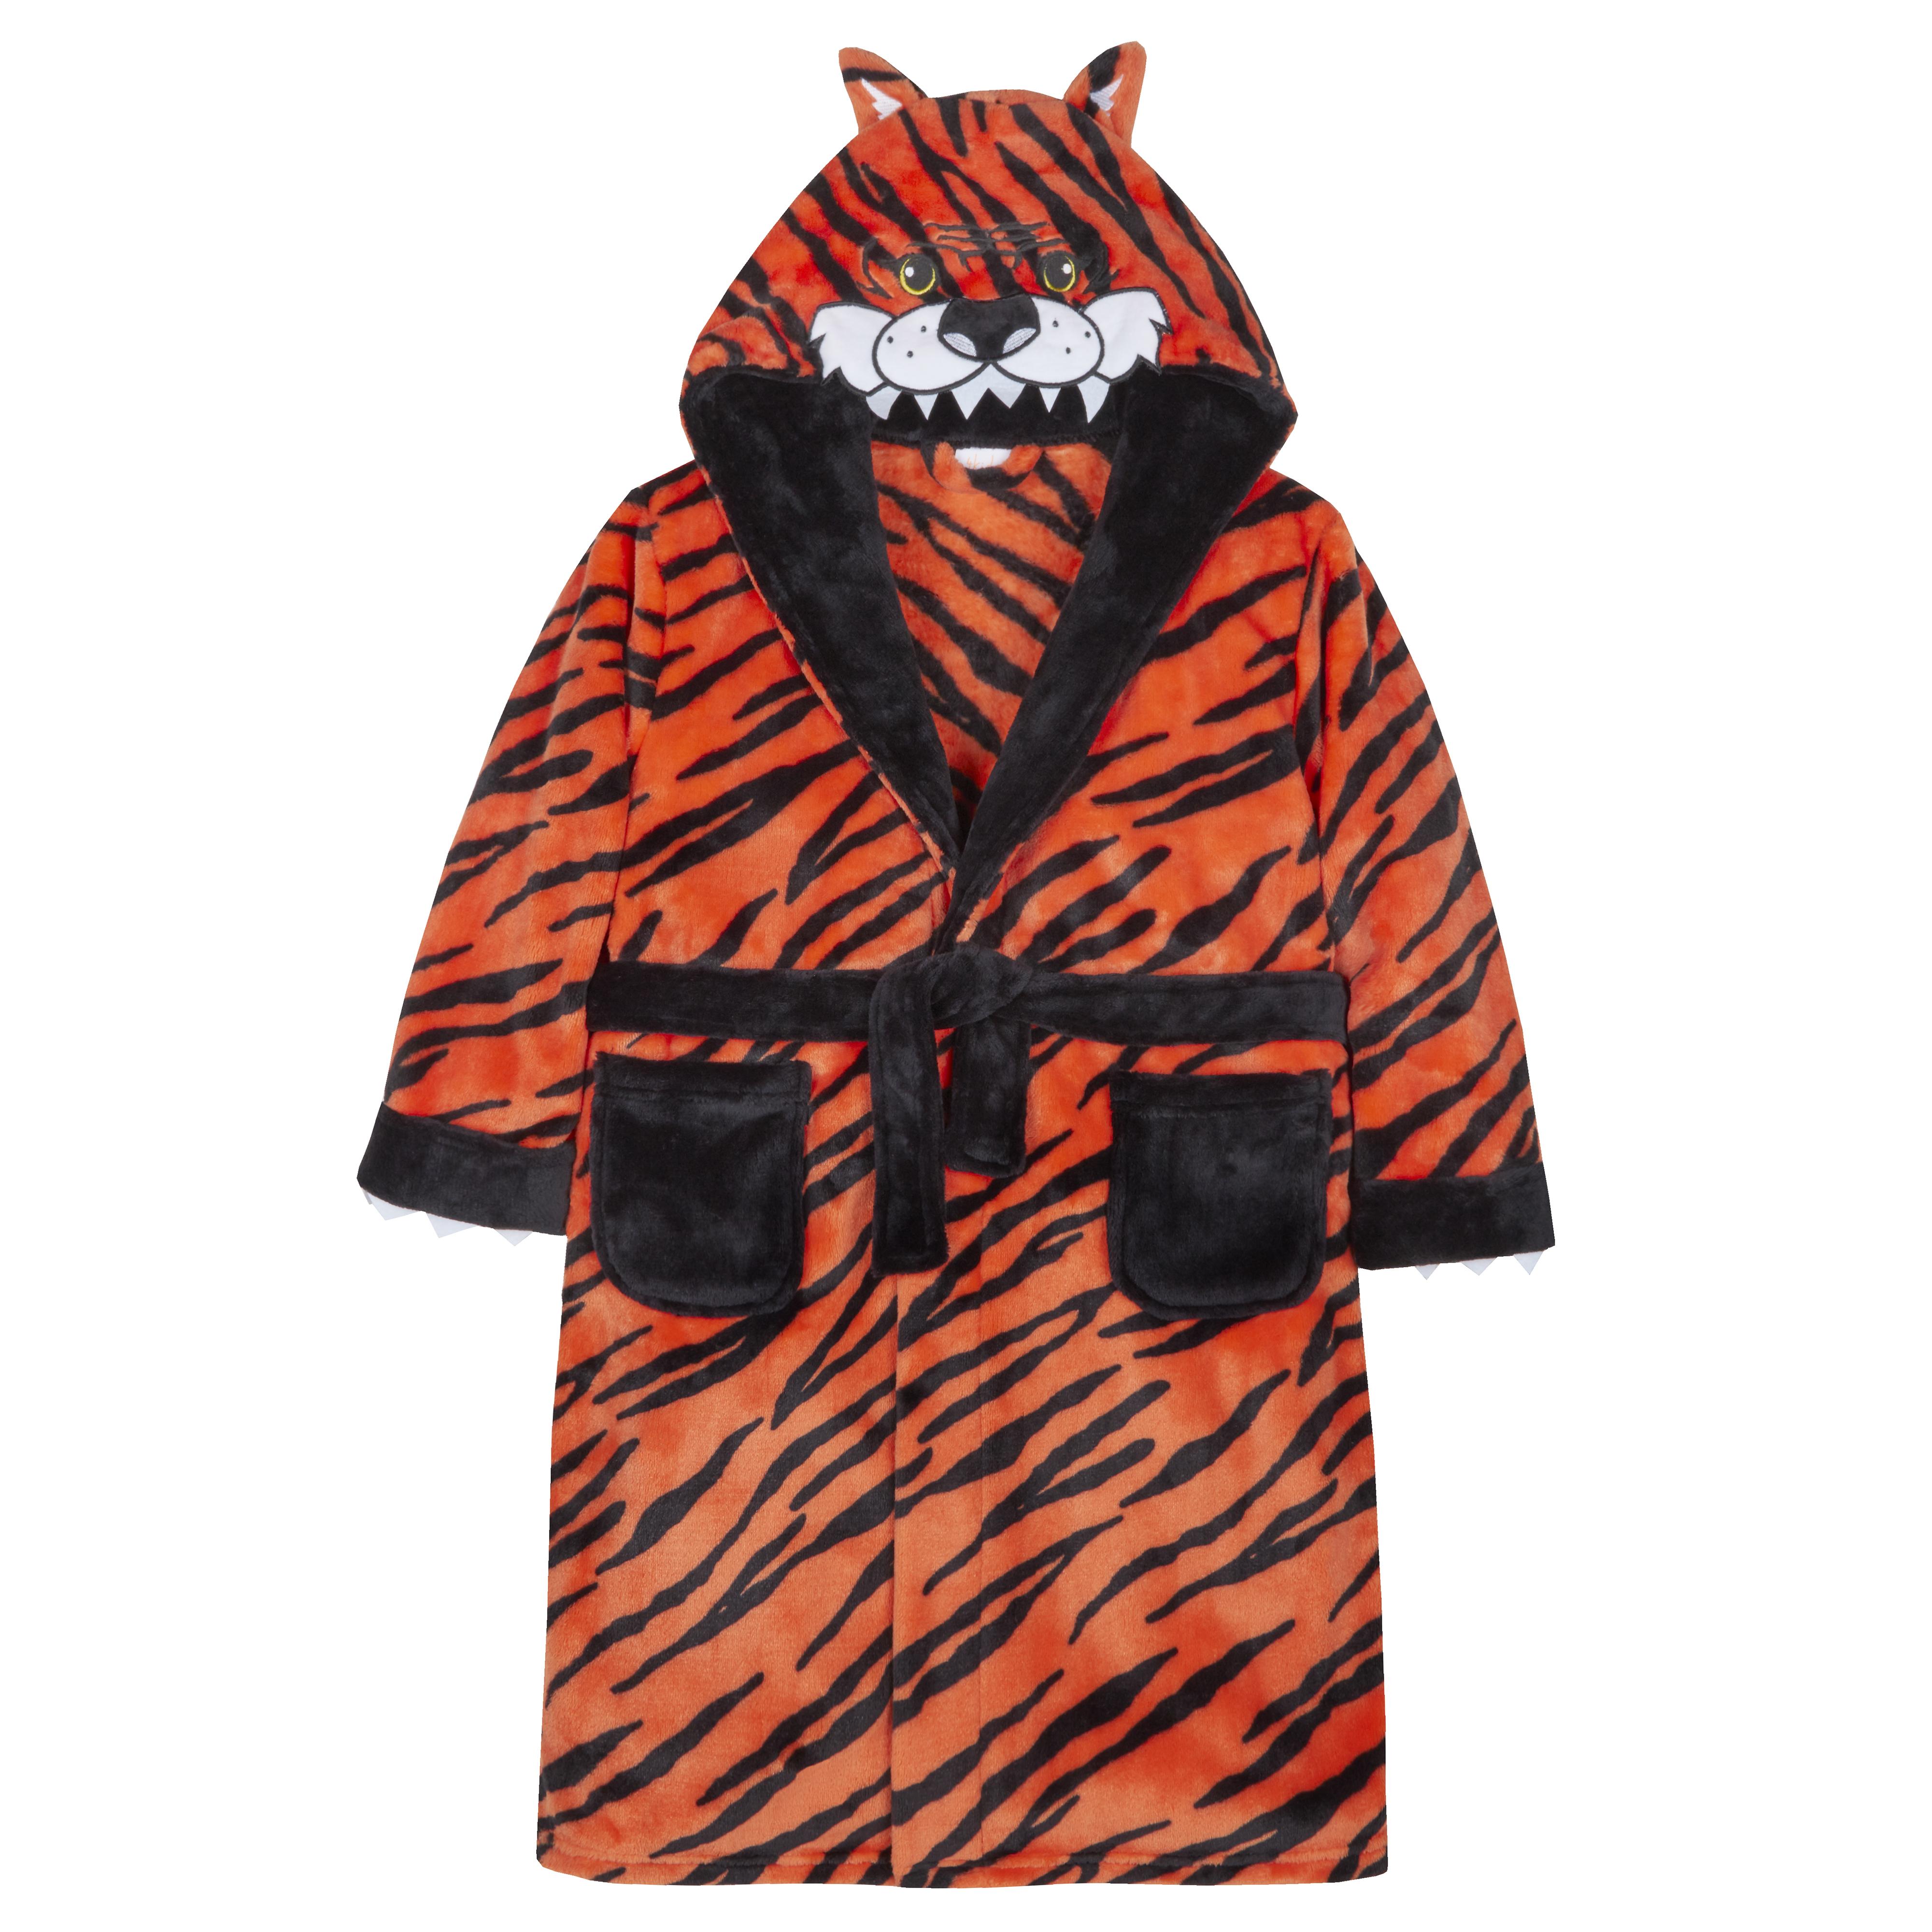 Metzuyan Boys Kids Gaming Gamer Novelty Dressing Gown Robe